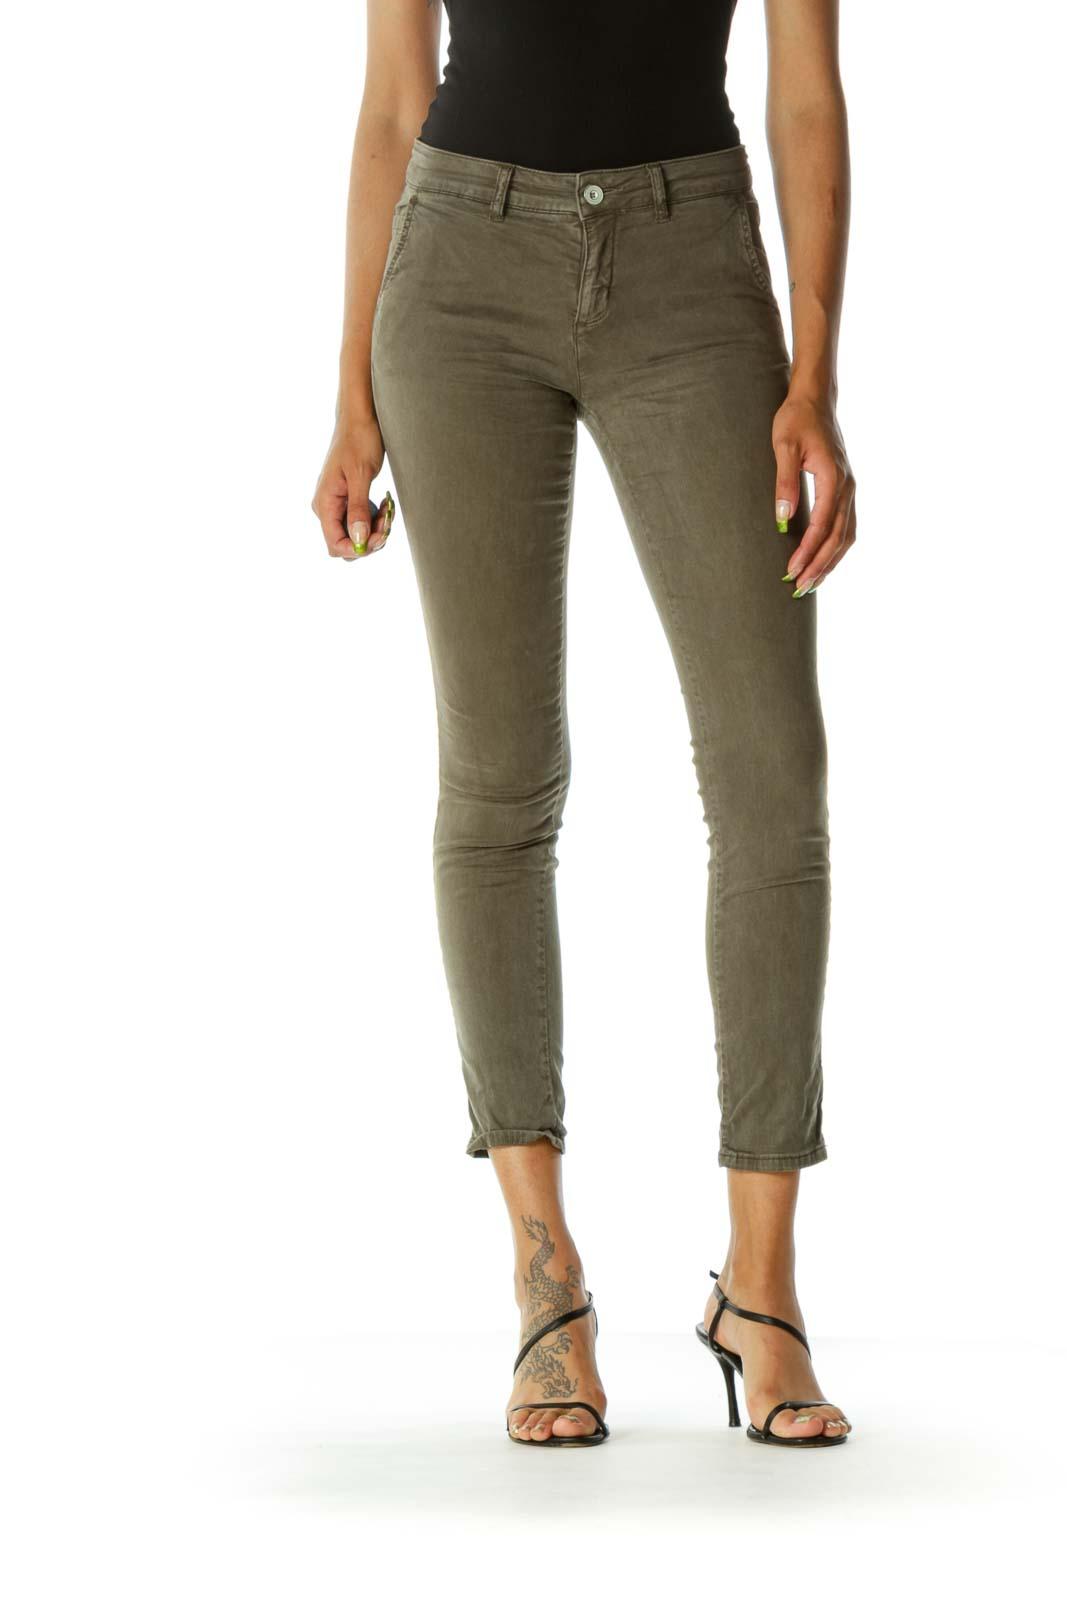 Olive Green Pocketed Slim Pants Front